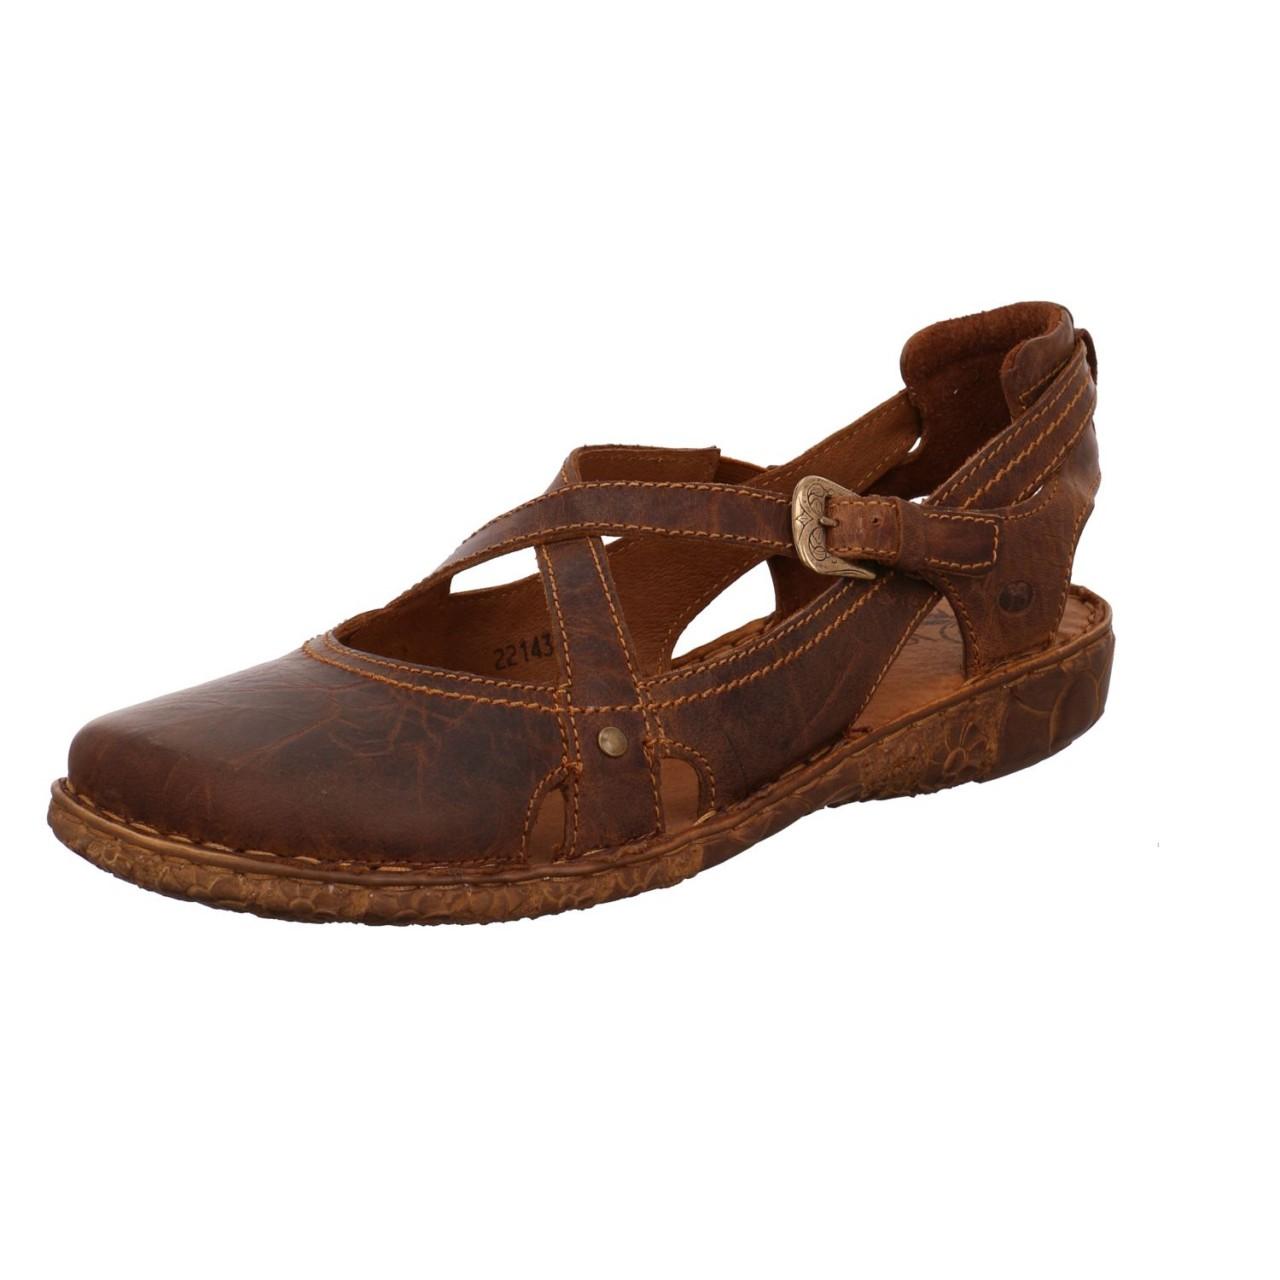 Seibel Komfort Sandalen braun NV,BRANDY braun